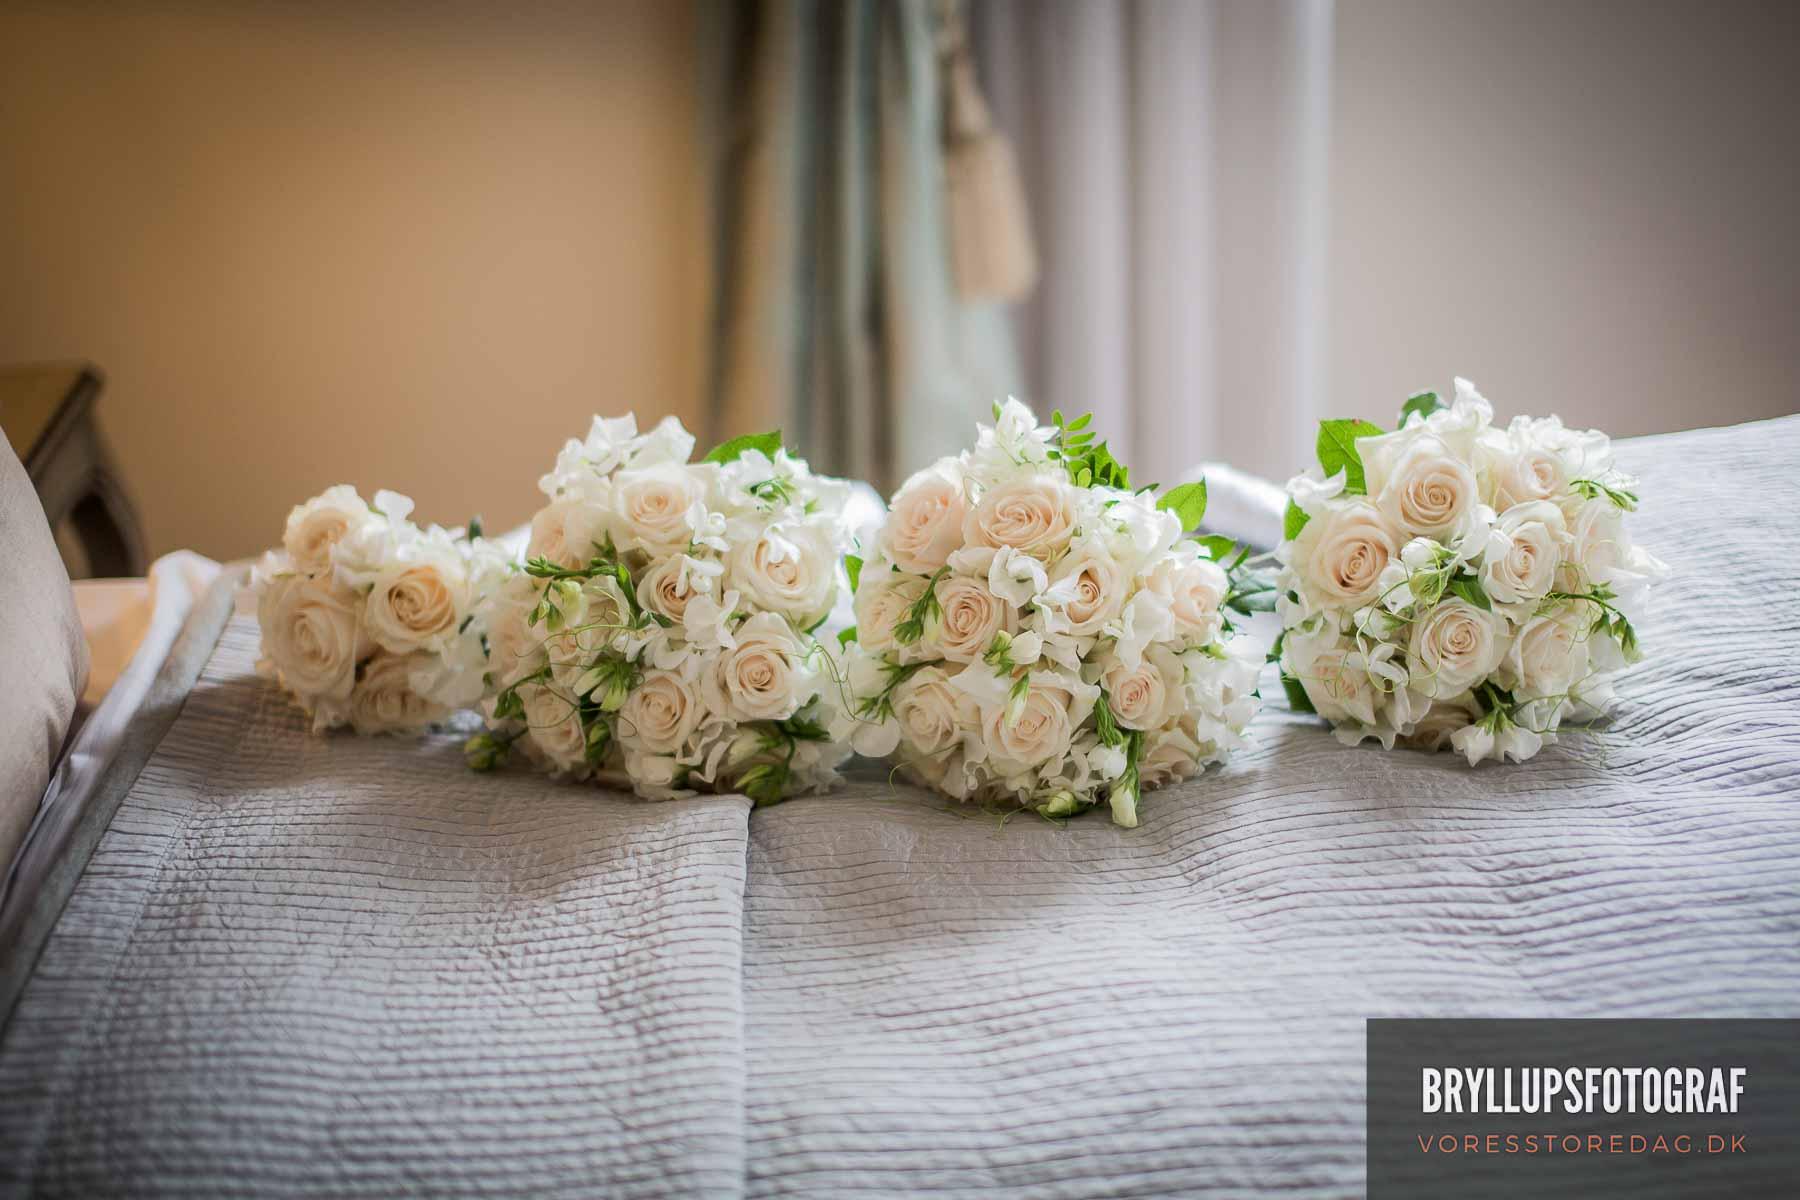 Ramsømagle Forsamlingshus bryllup